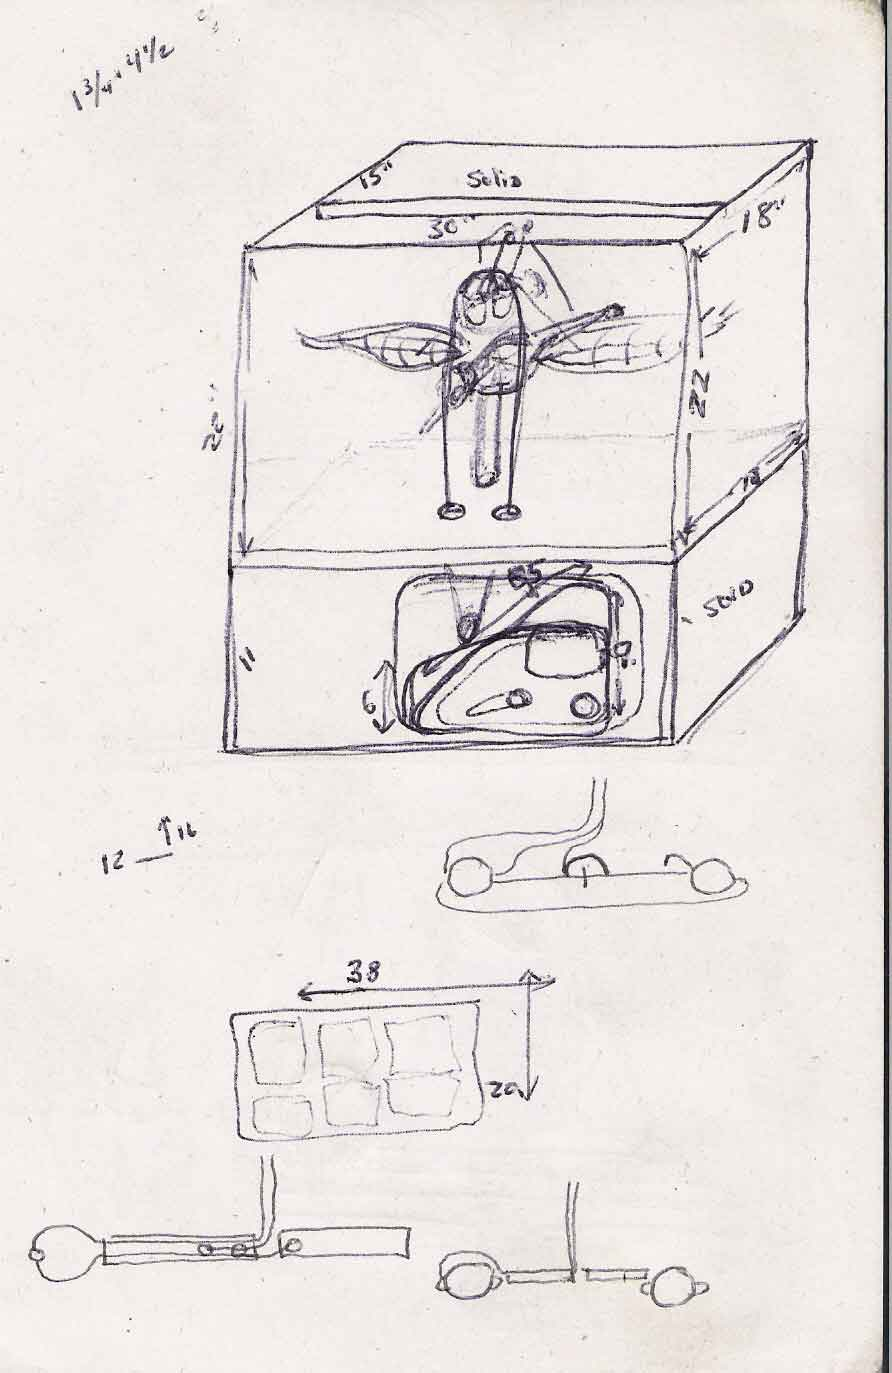 sketch-17-sept-05.jpg